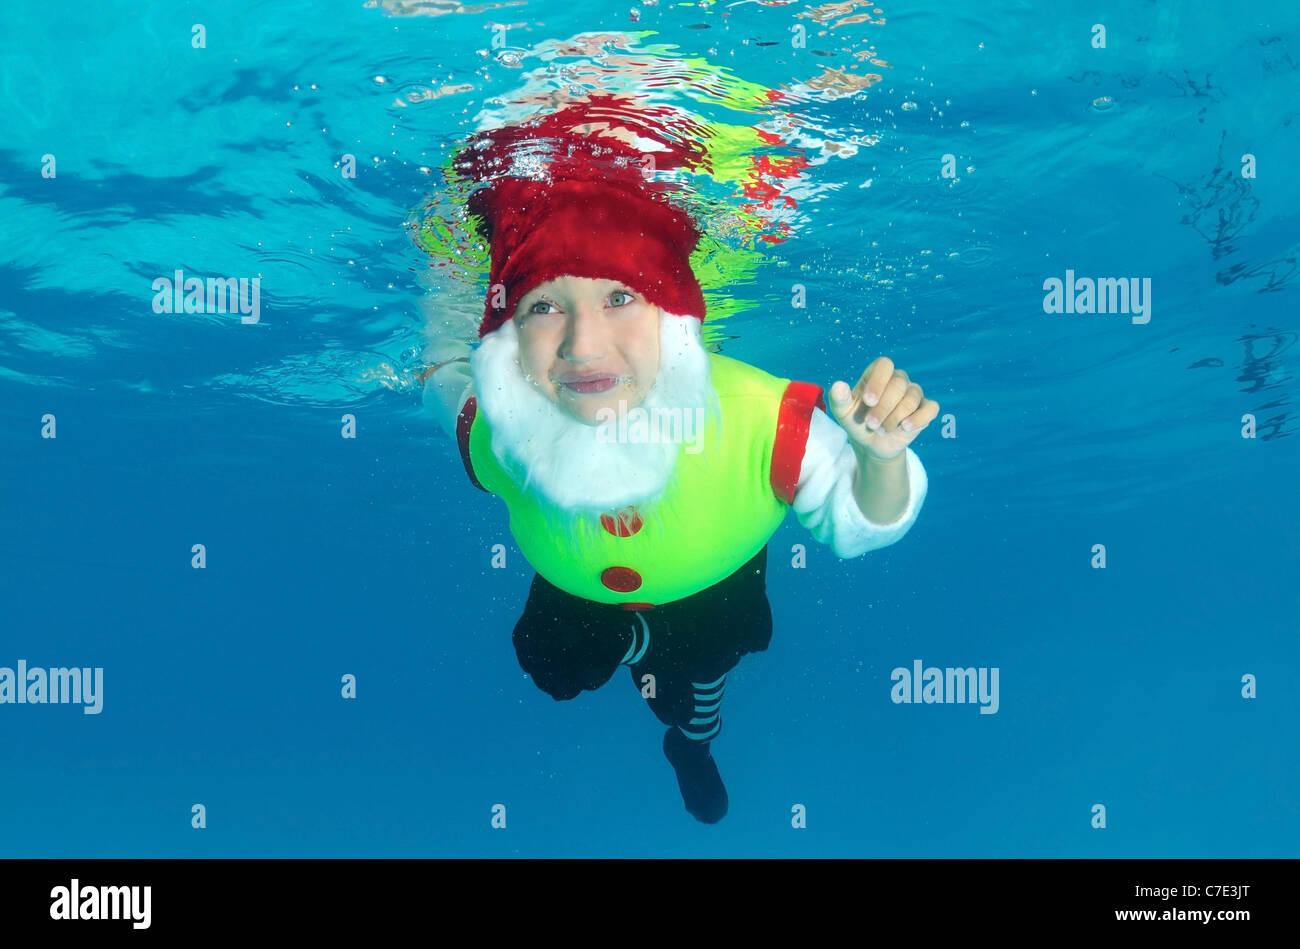 Underwater ART / Fashion in pool - Stock Image